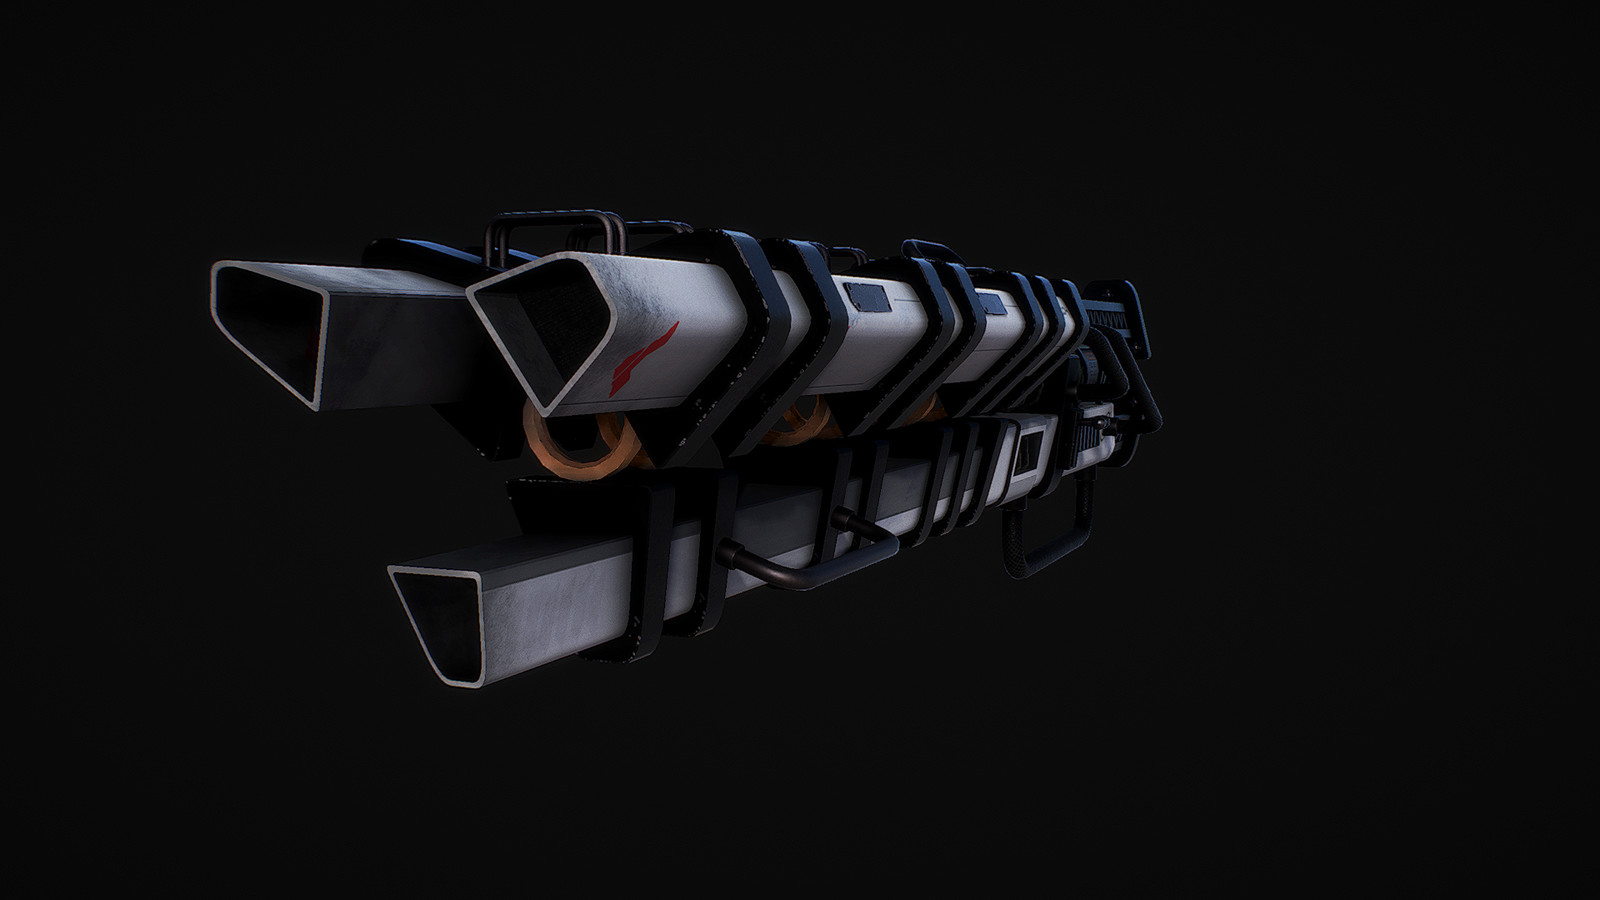 Futurastic Laser Gun